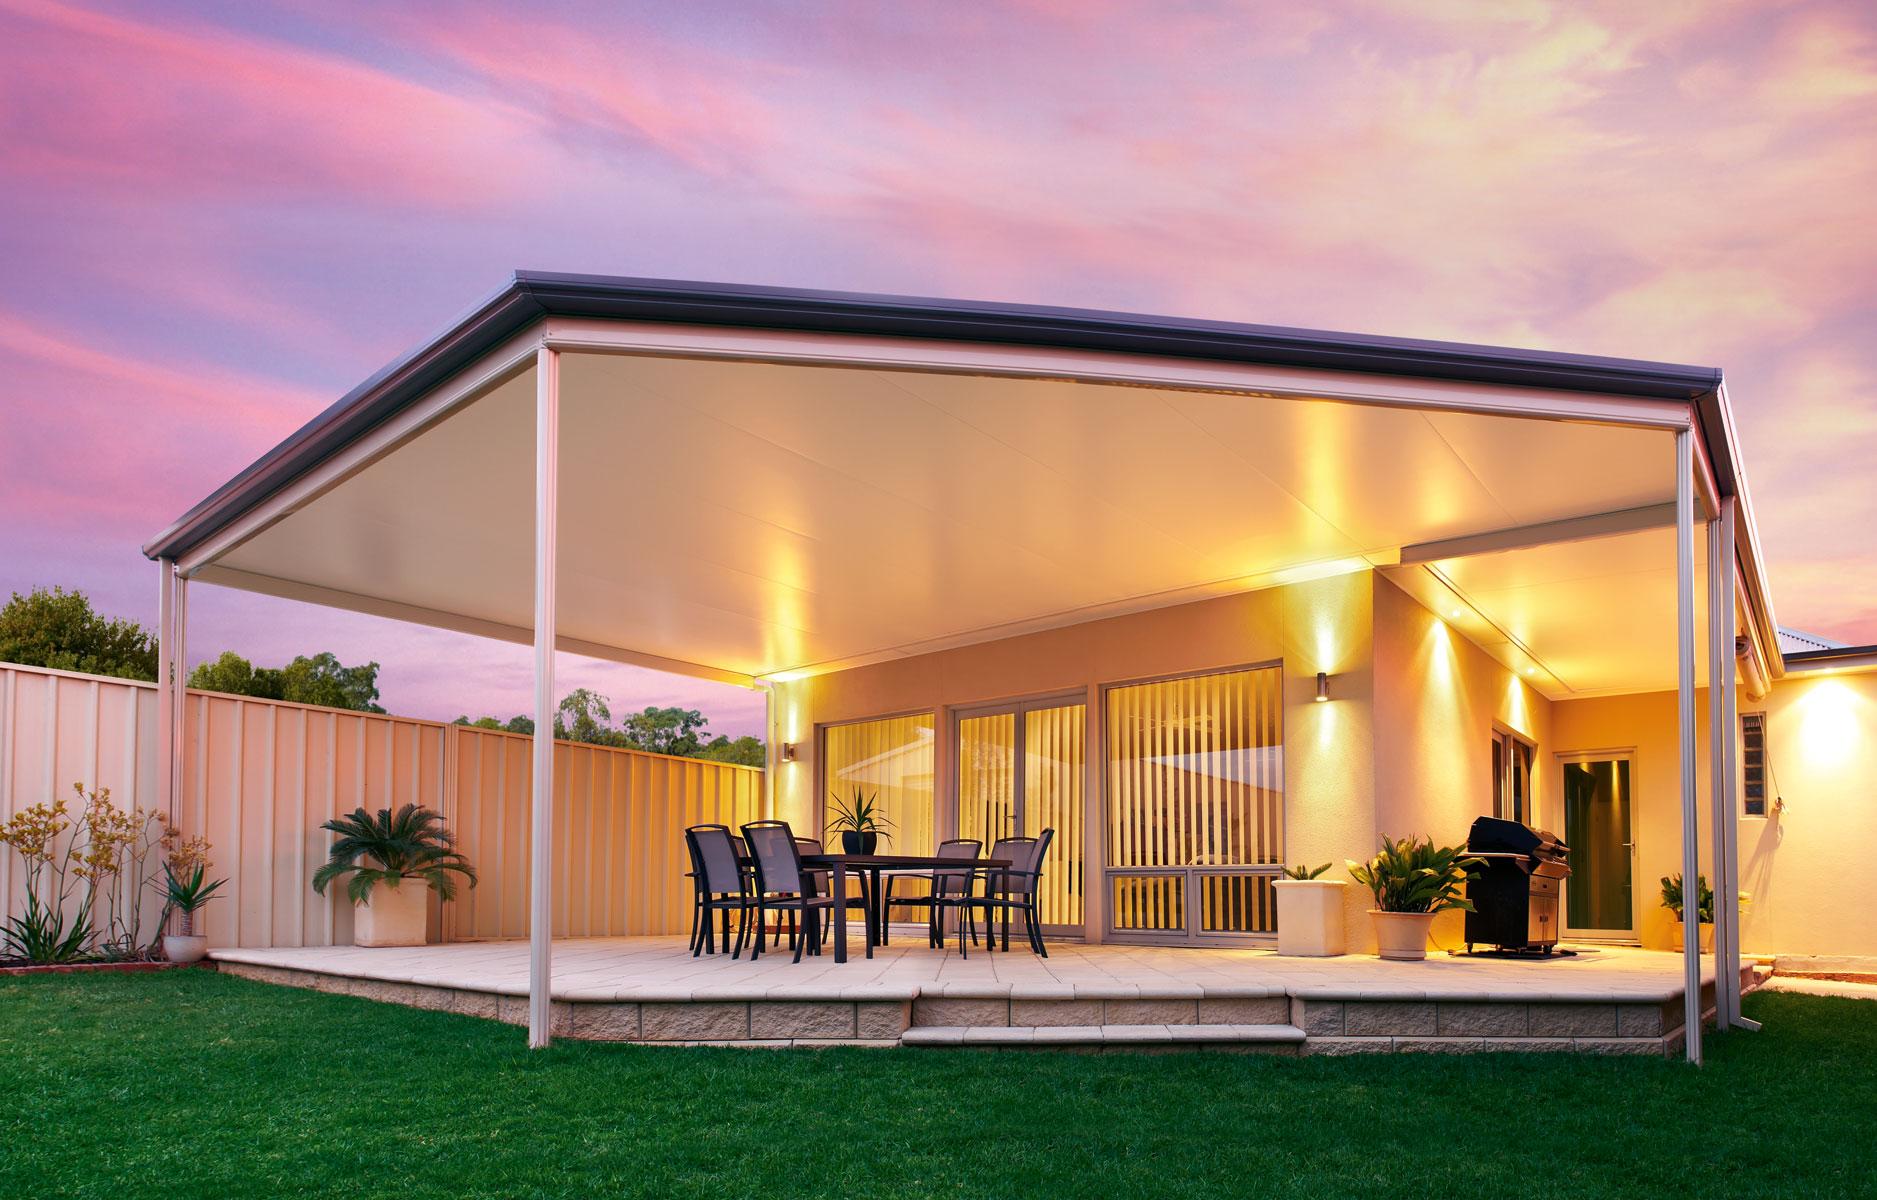 Roof Design Ideas: Welcome To Verandah Creations